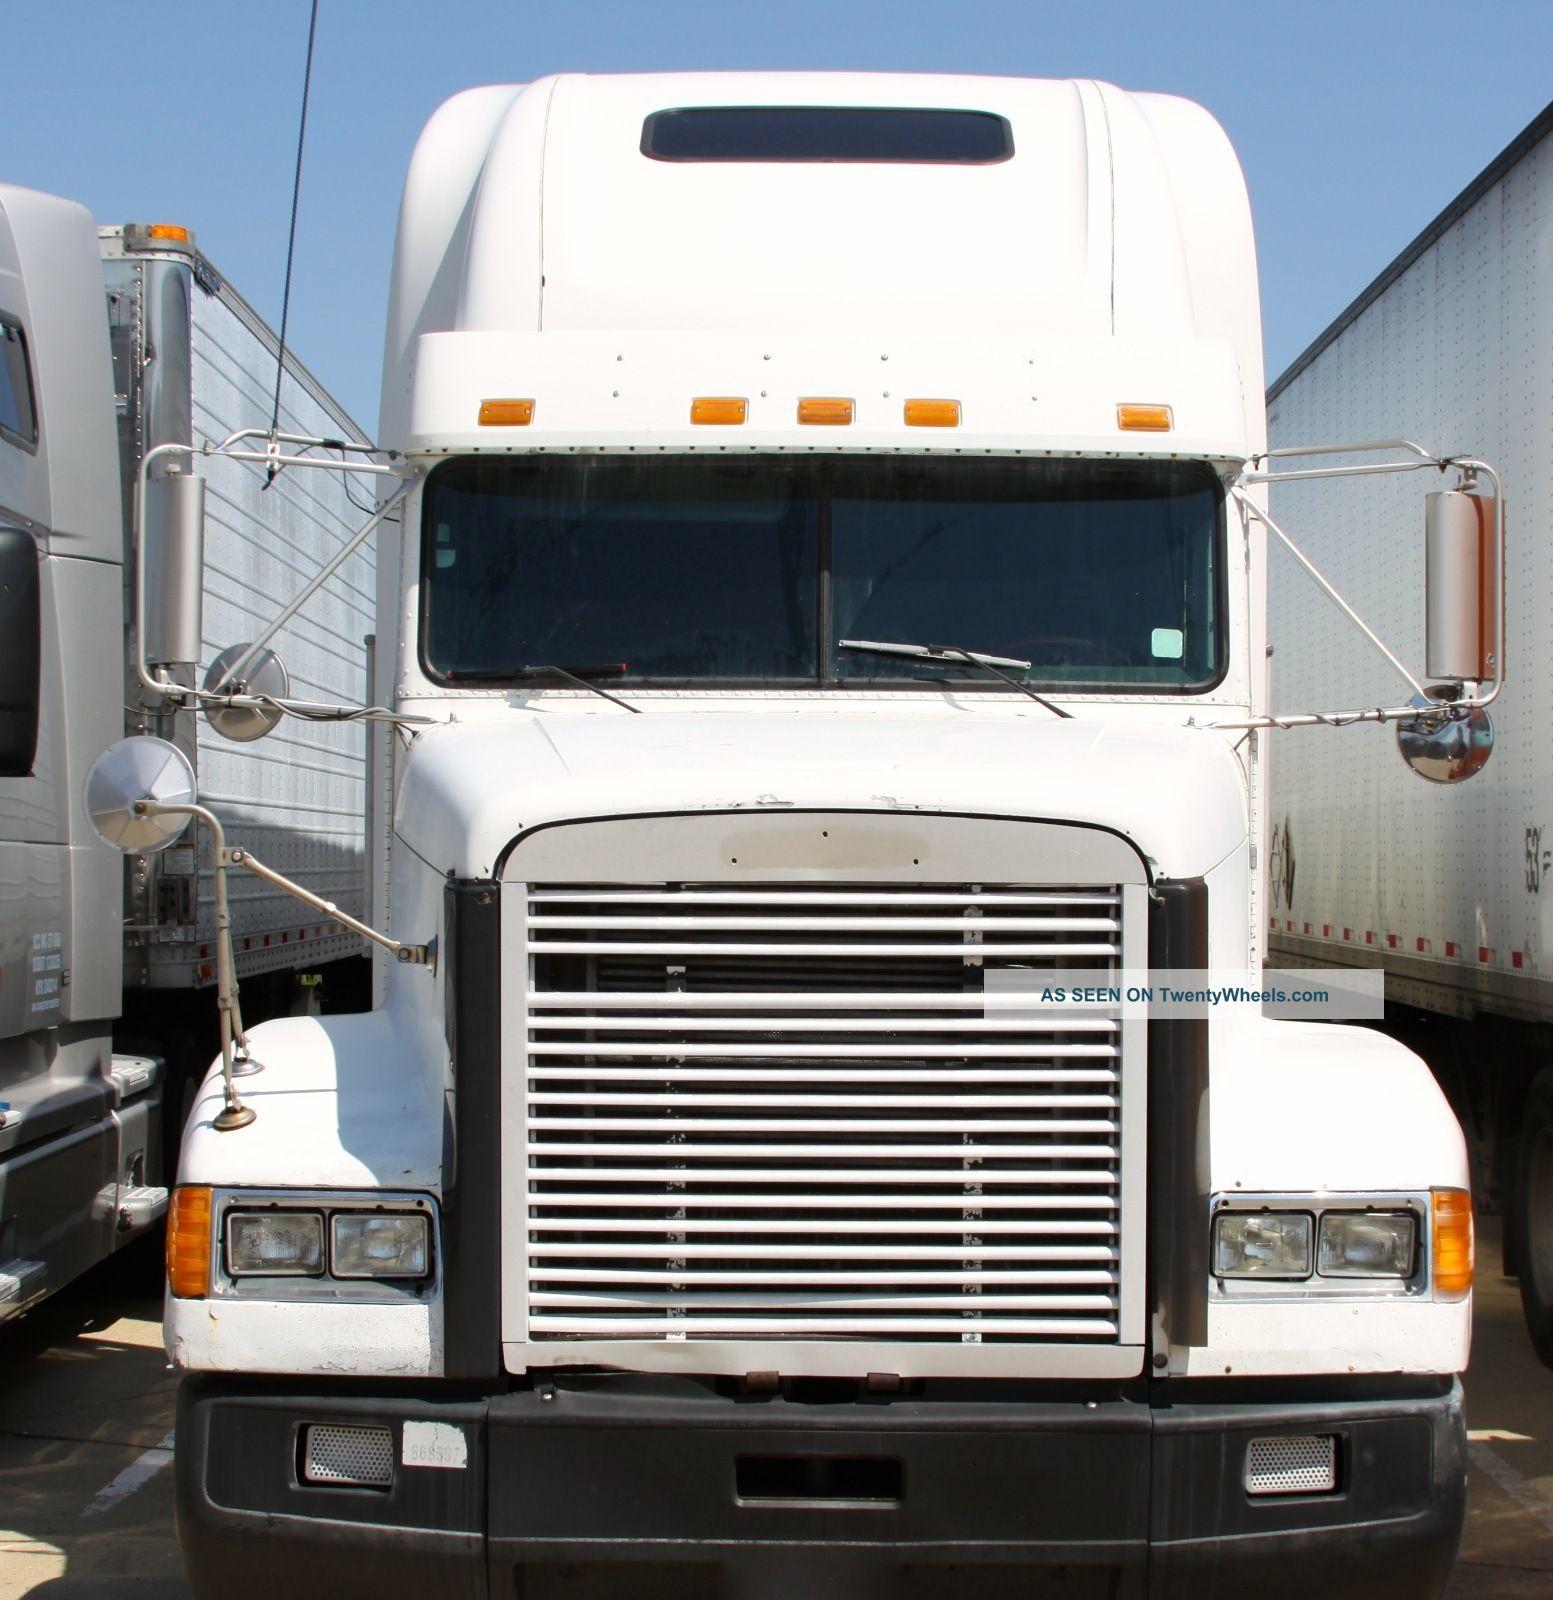 2000 Freightliner Fld120 Sleeper Semi Trucks photo